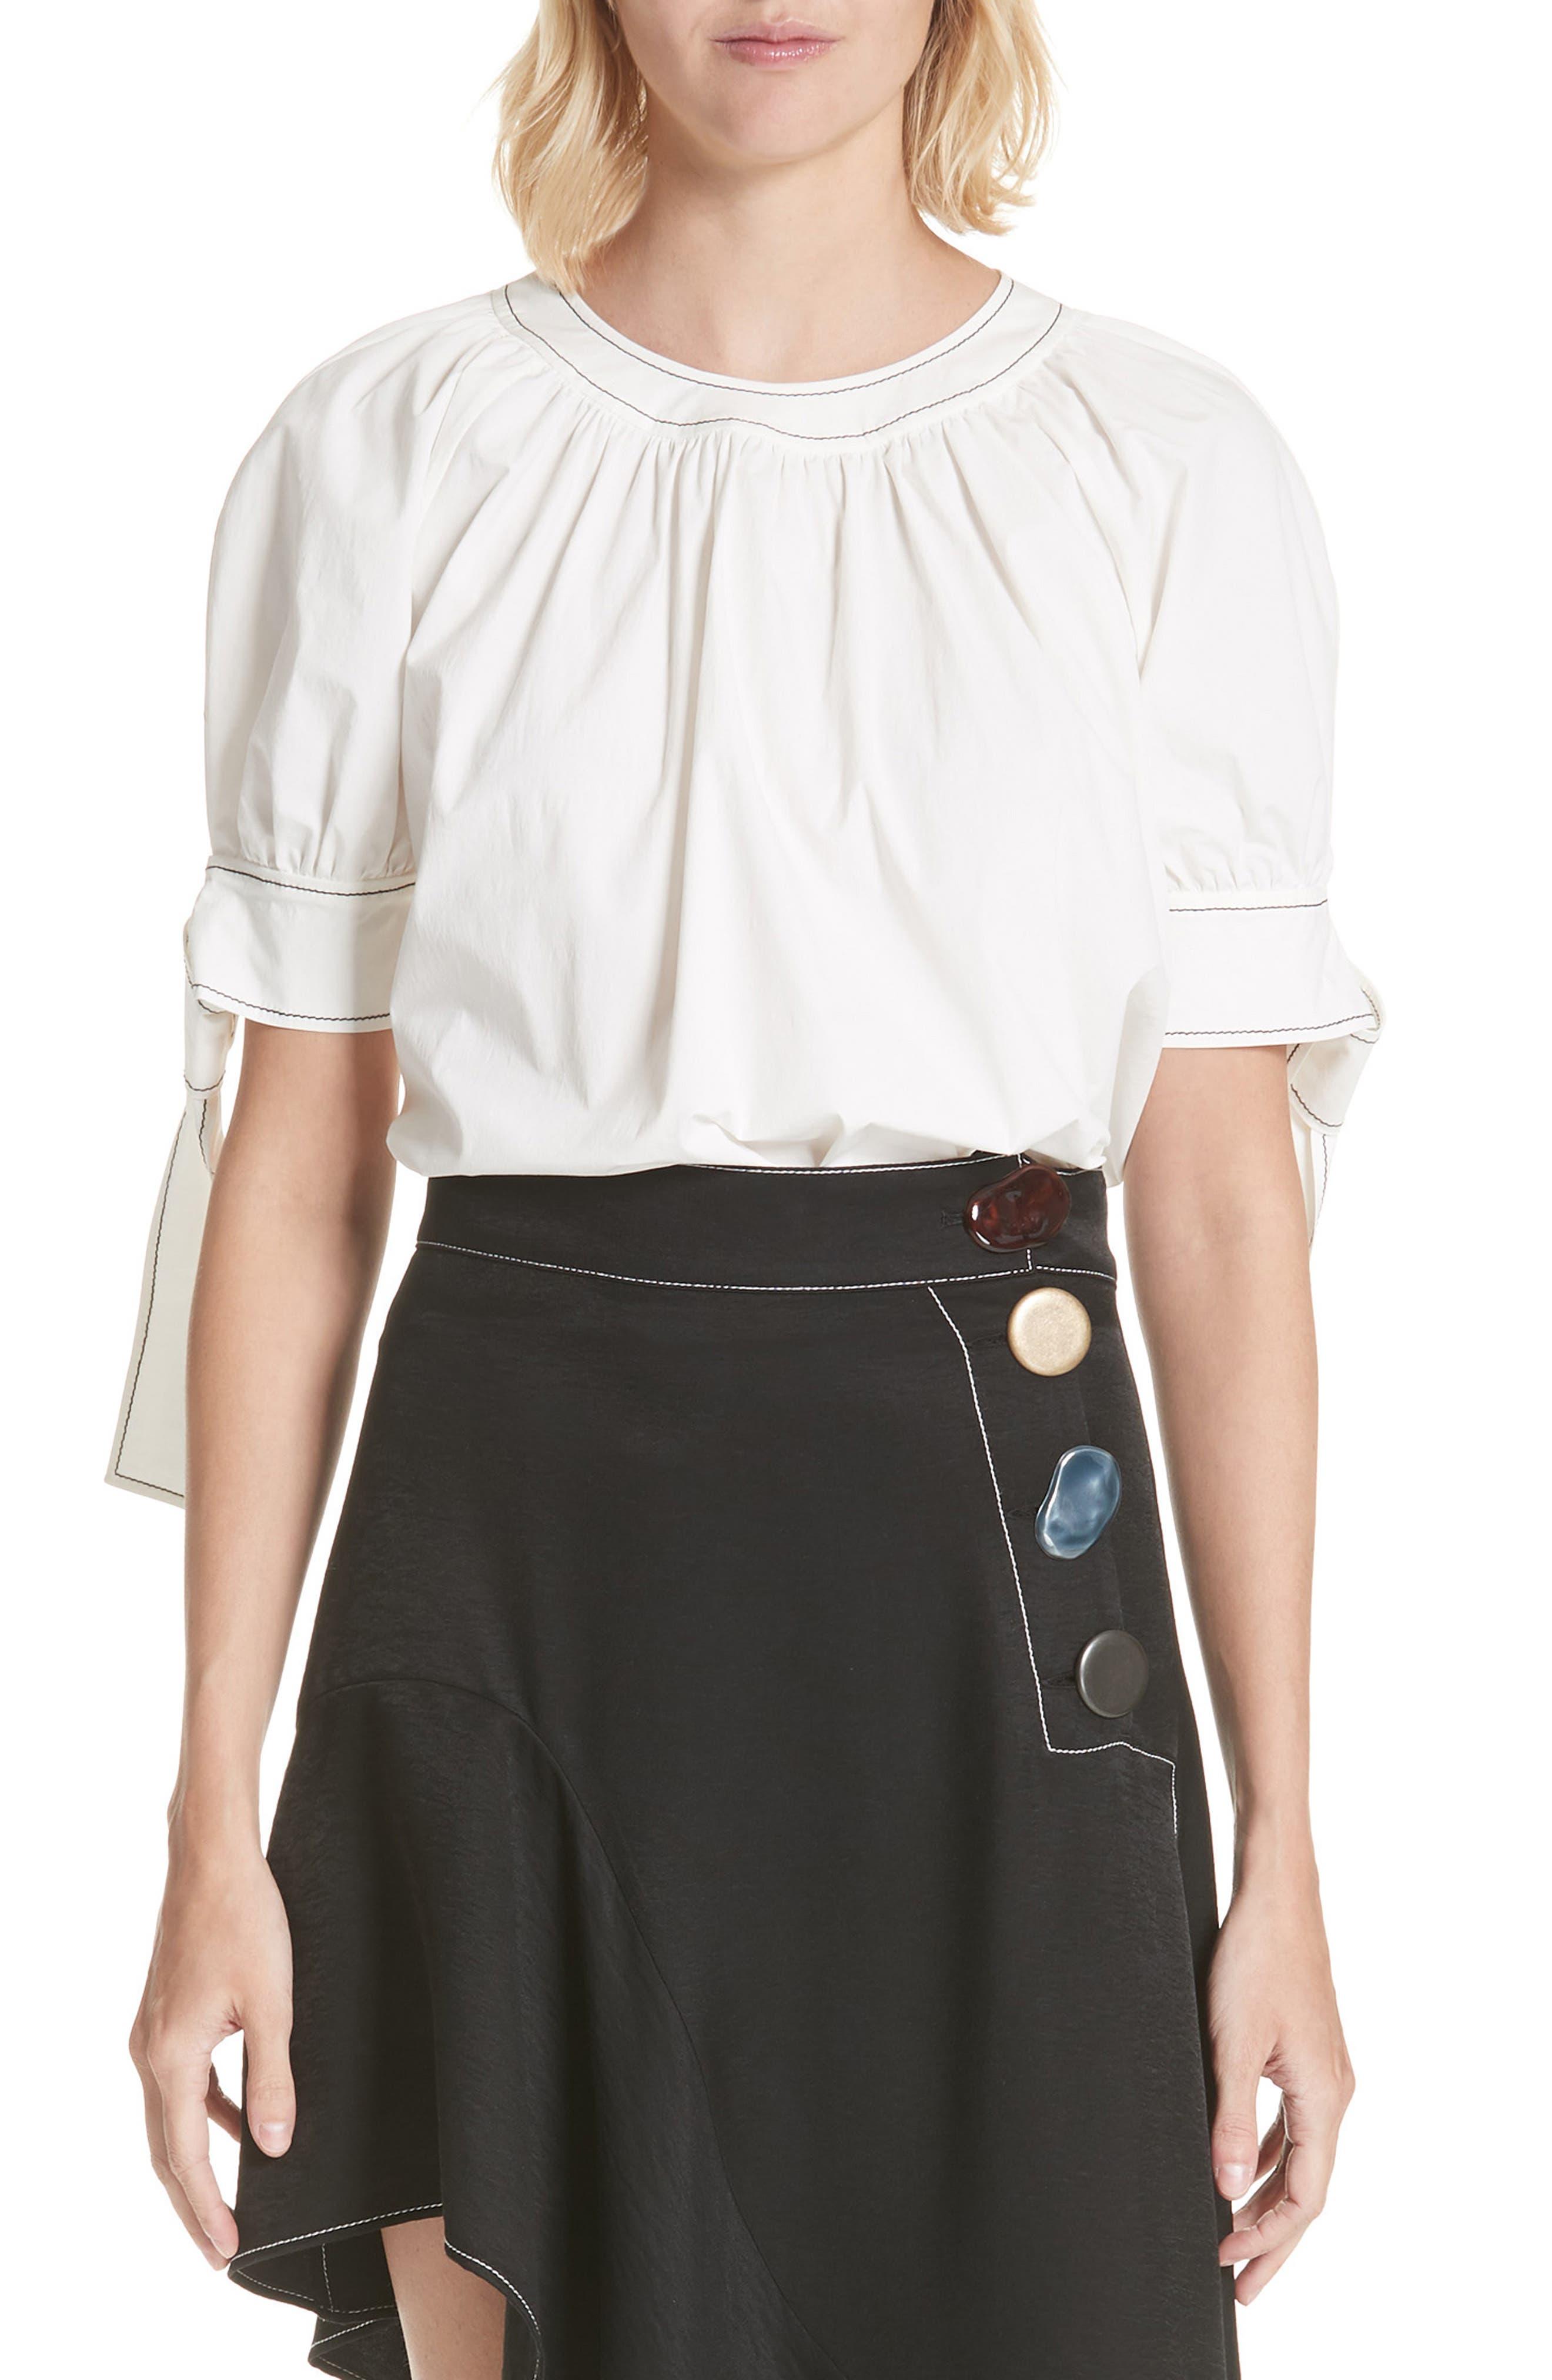 Hailey Short Sleeve Blouse Top,                             Main thumbnail 1, color,                             Cotton White